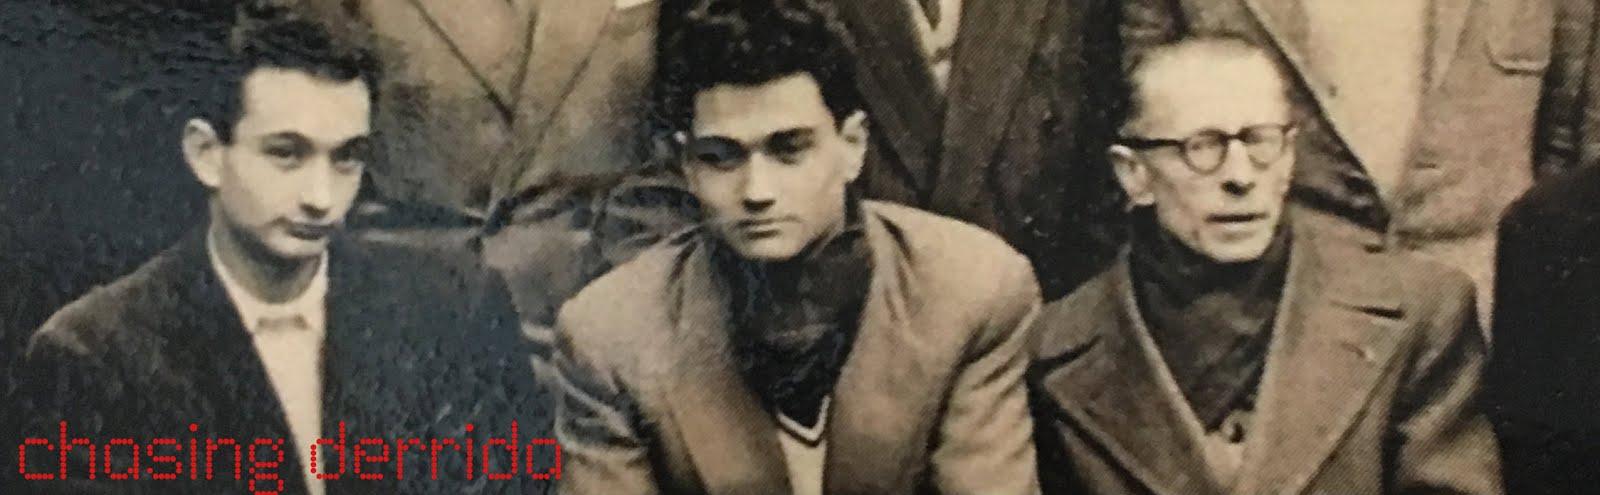 Chasing Derrida